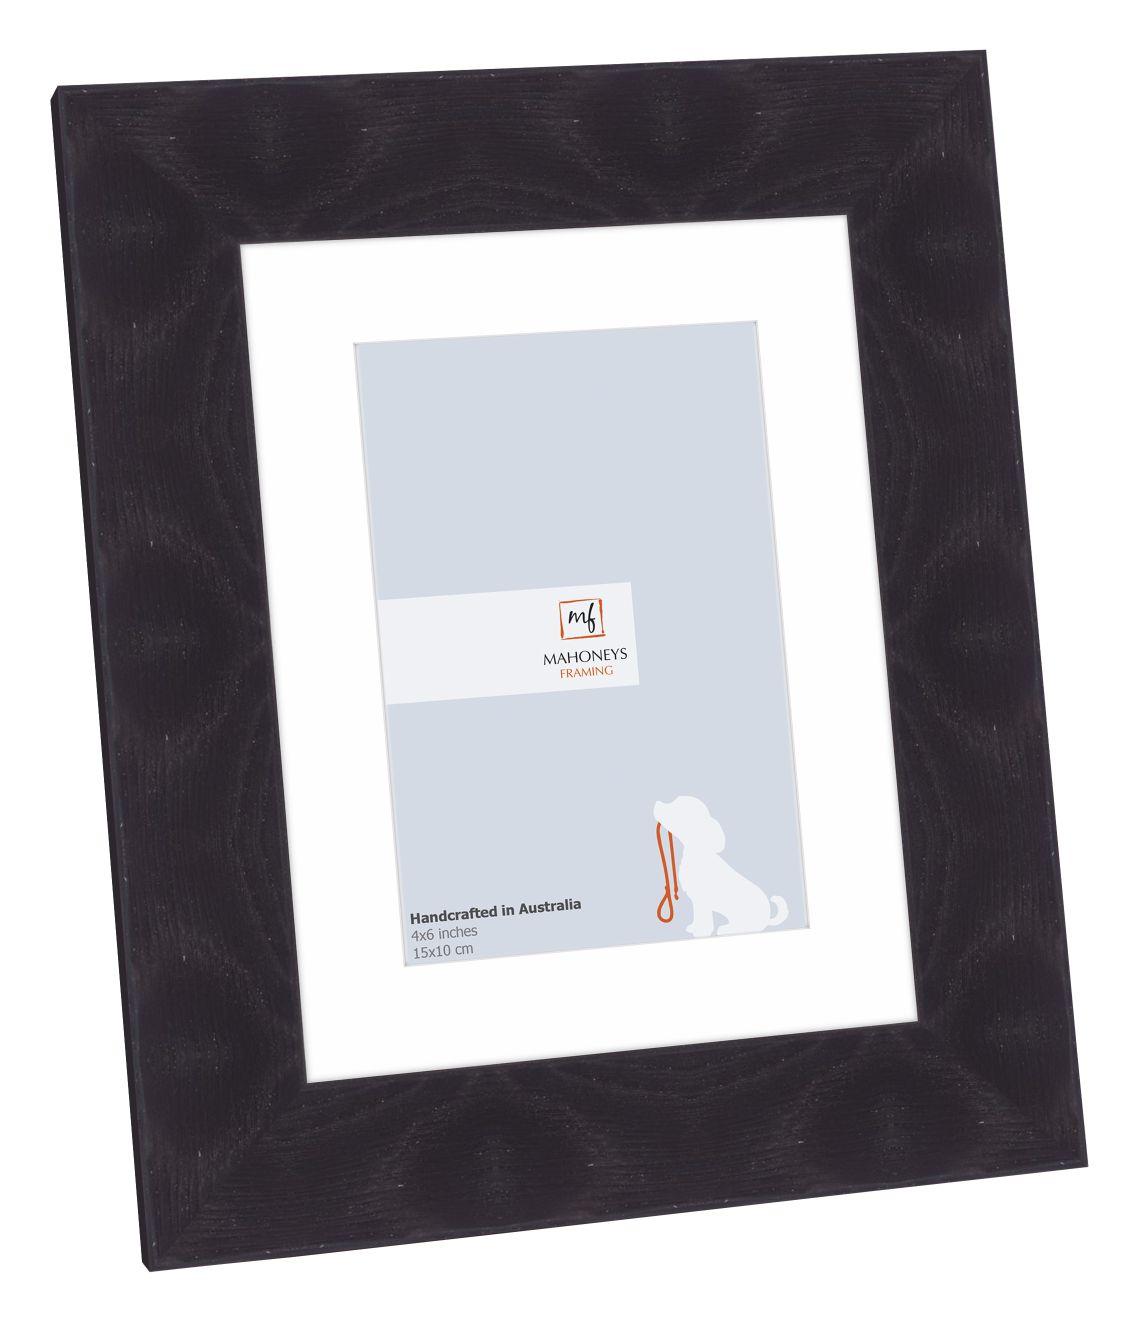 4x6inch black picture frame beita 4cm width 25cm mat 4x6inch black picture frame beita 4cm width 25cm mat picture frames online jeuxipadfo Images